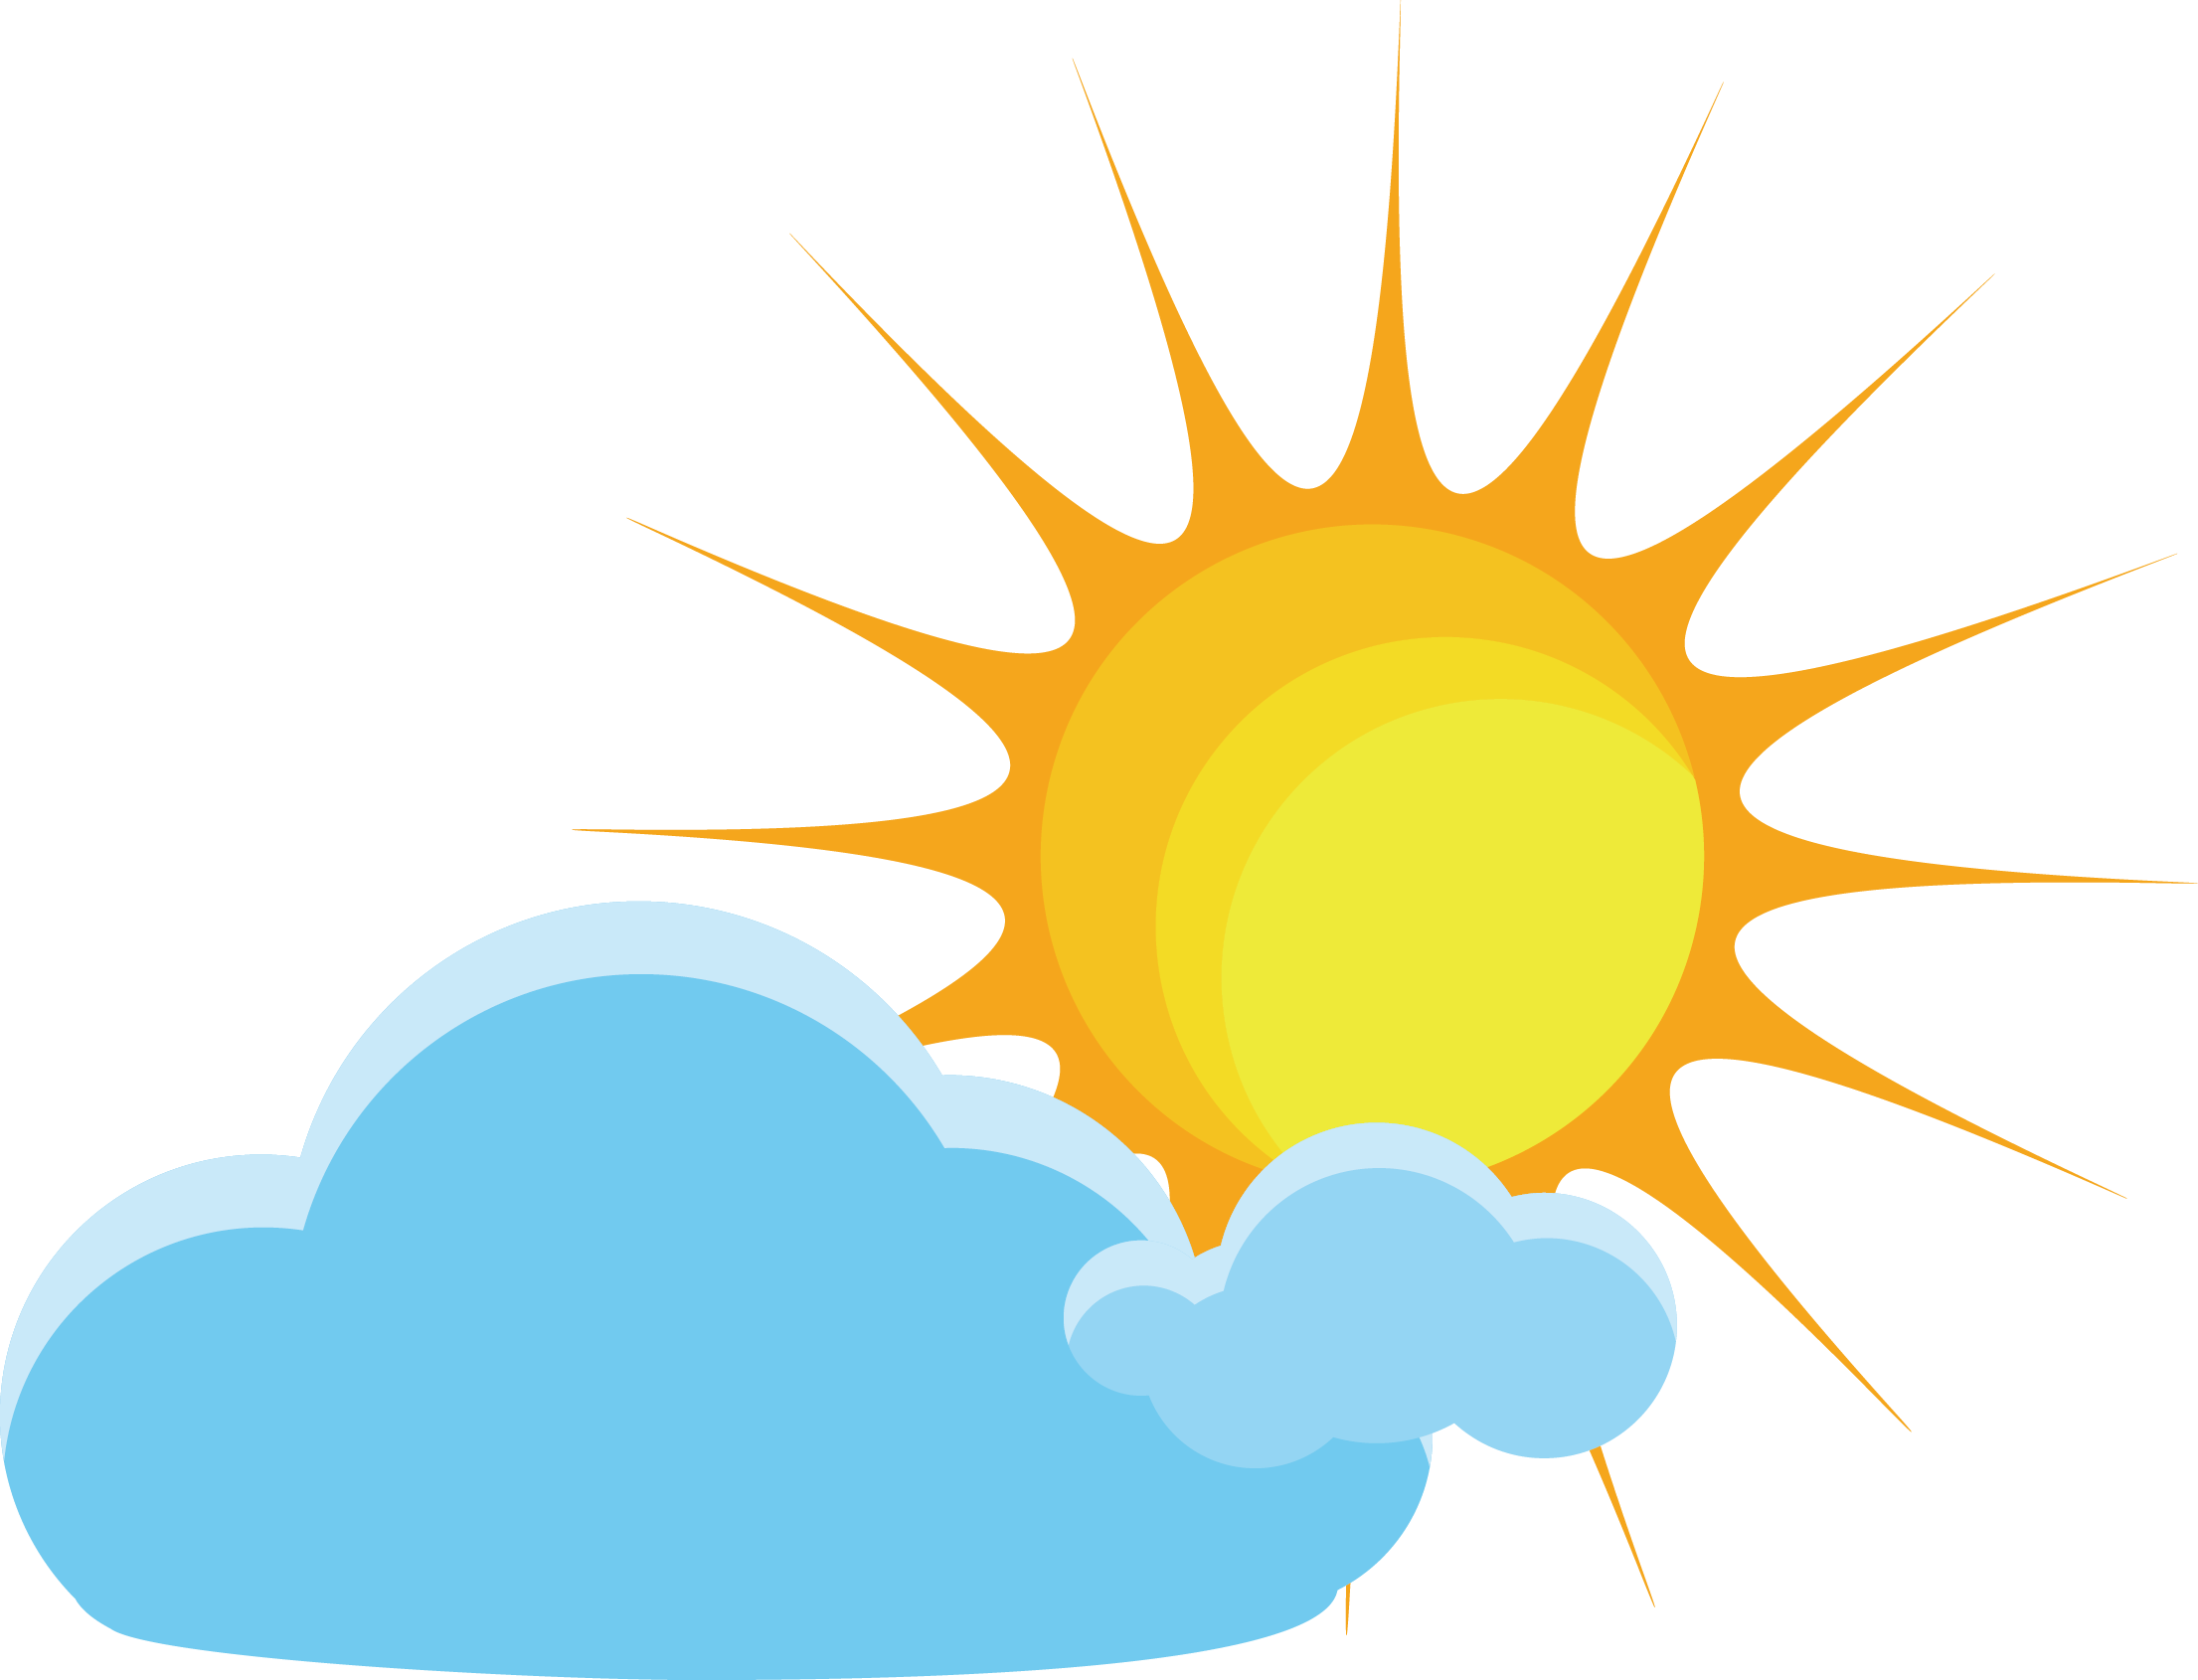 Sunny clipart sunny season, Sunny sunny season Transparent.